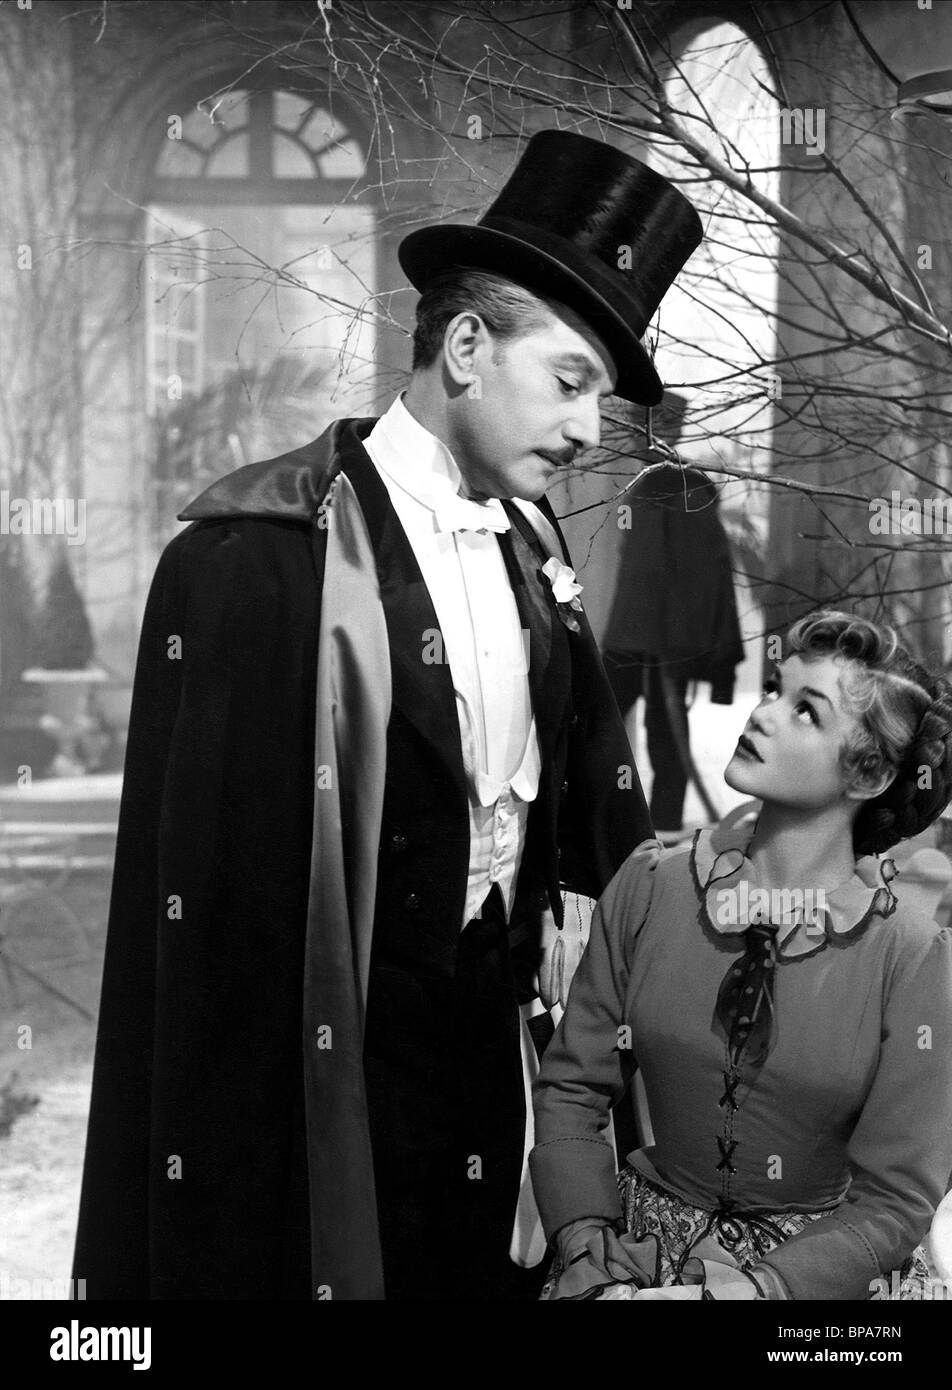 ANTON WALBROOK, SIMONE SIMON, LA RONDE, 1950 - Stock Image